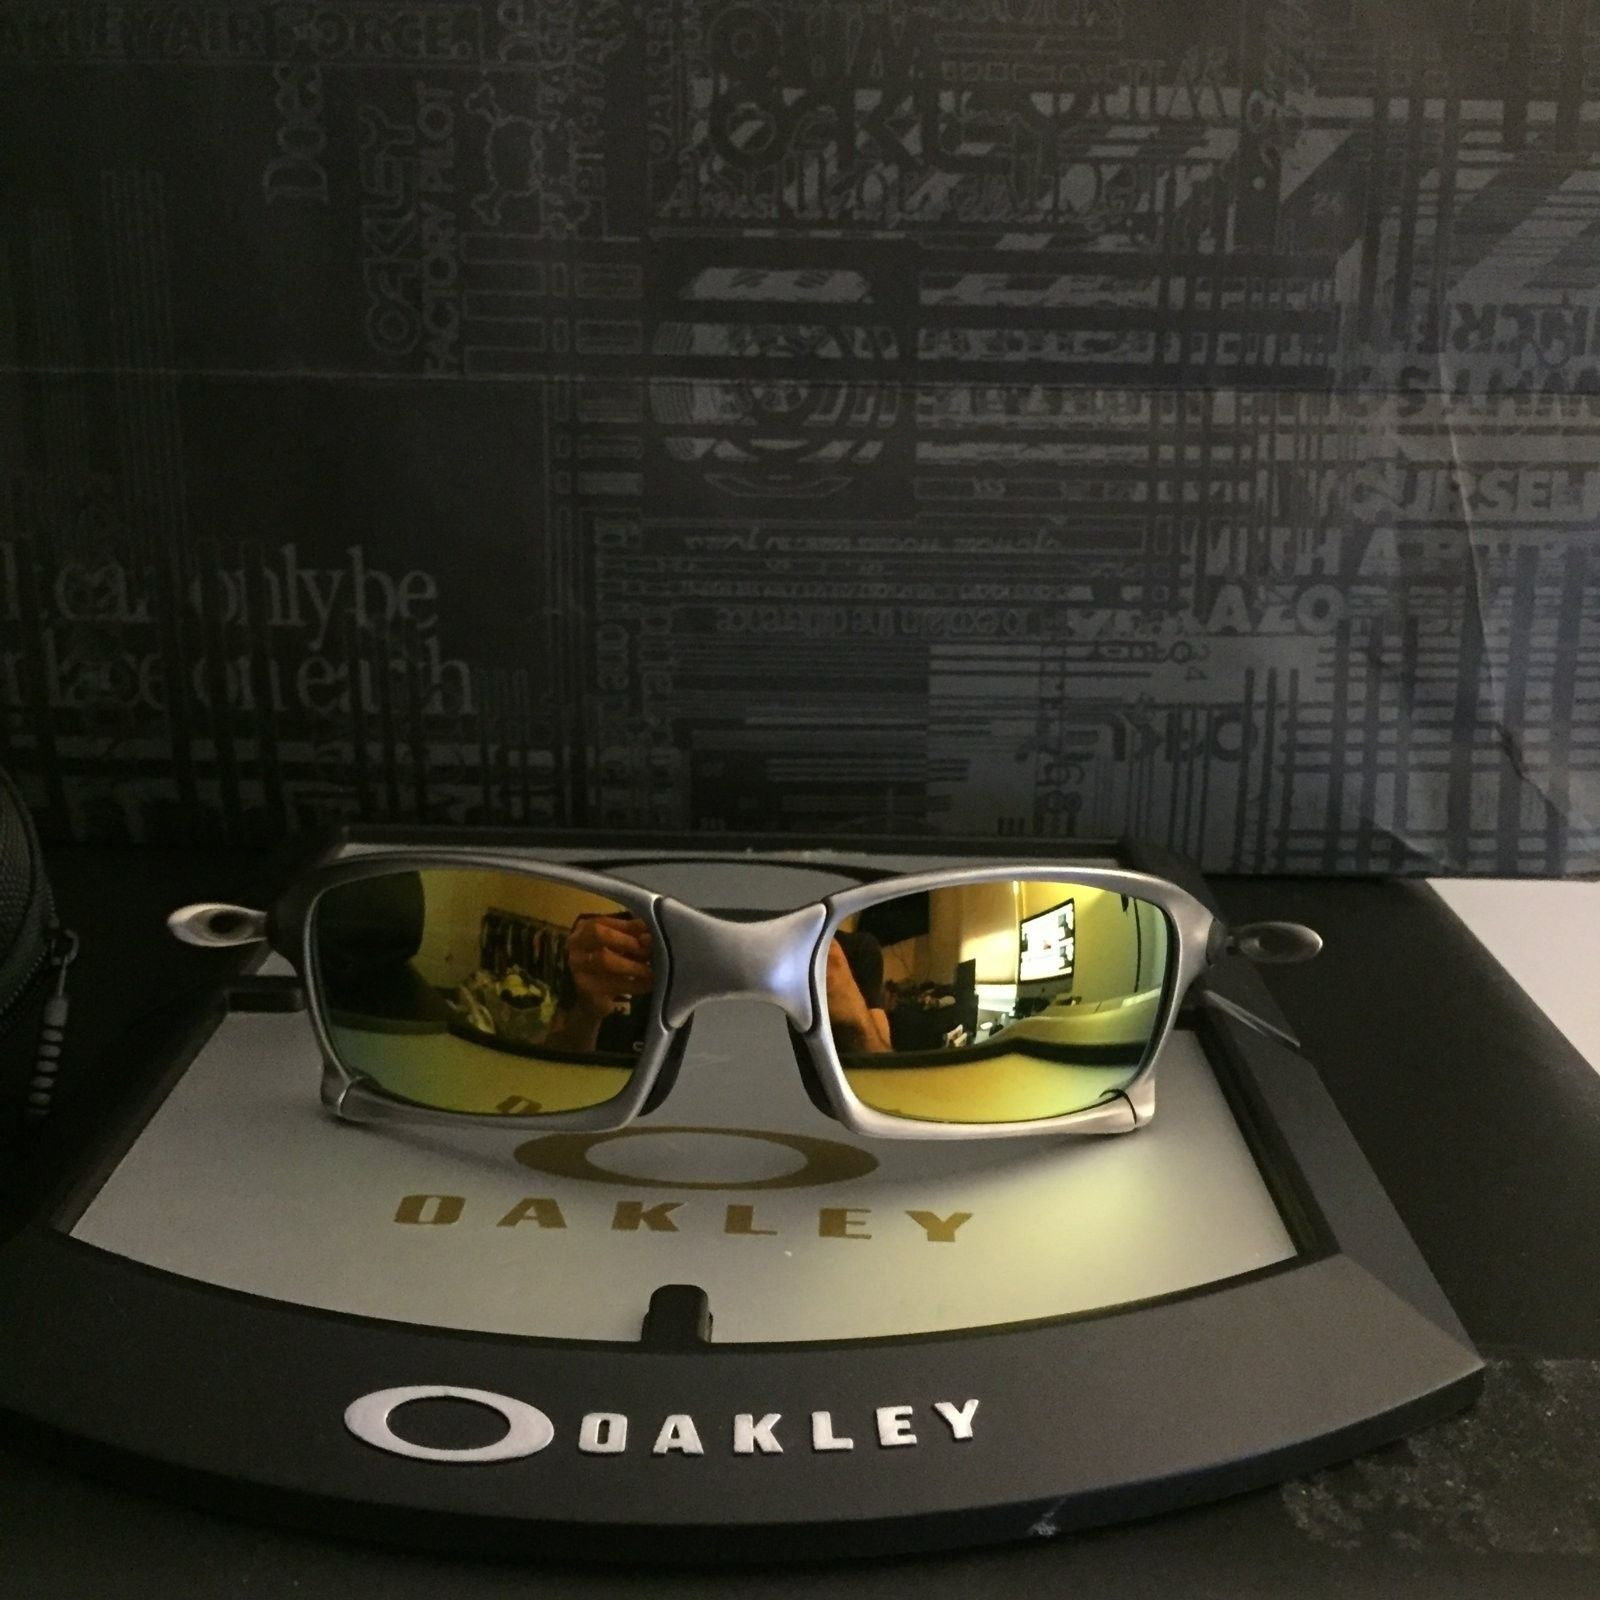 Oakley XS PLASMA FIRE COMPLETE PRICE DROP! - IMG_4886.JPG